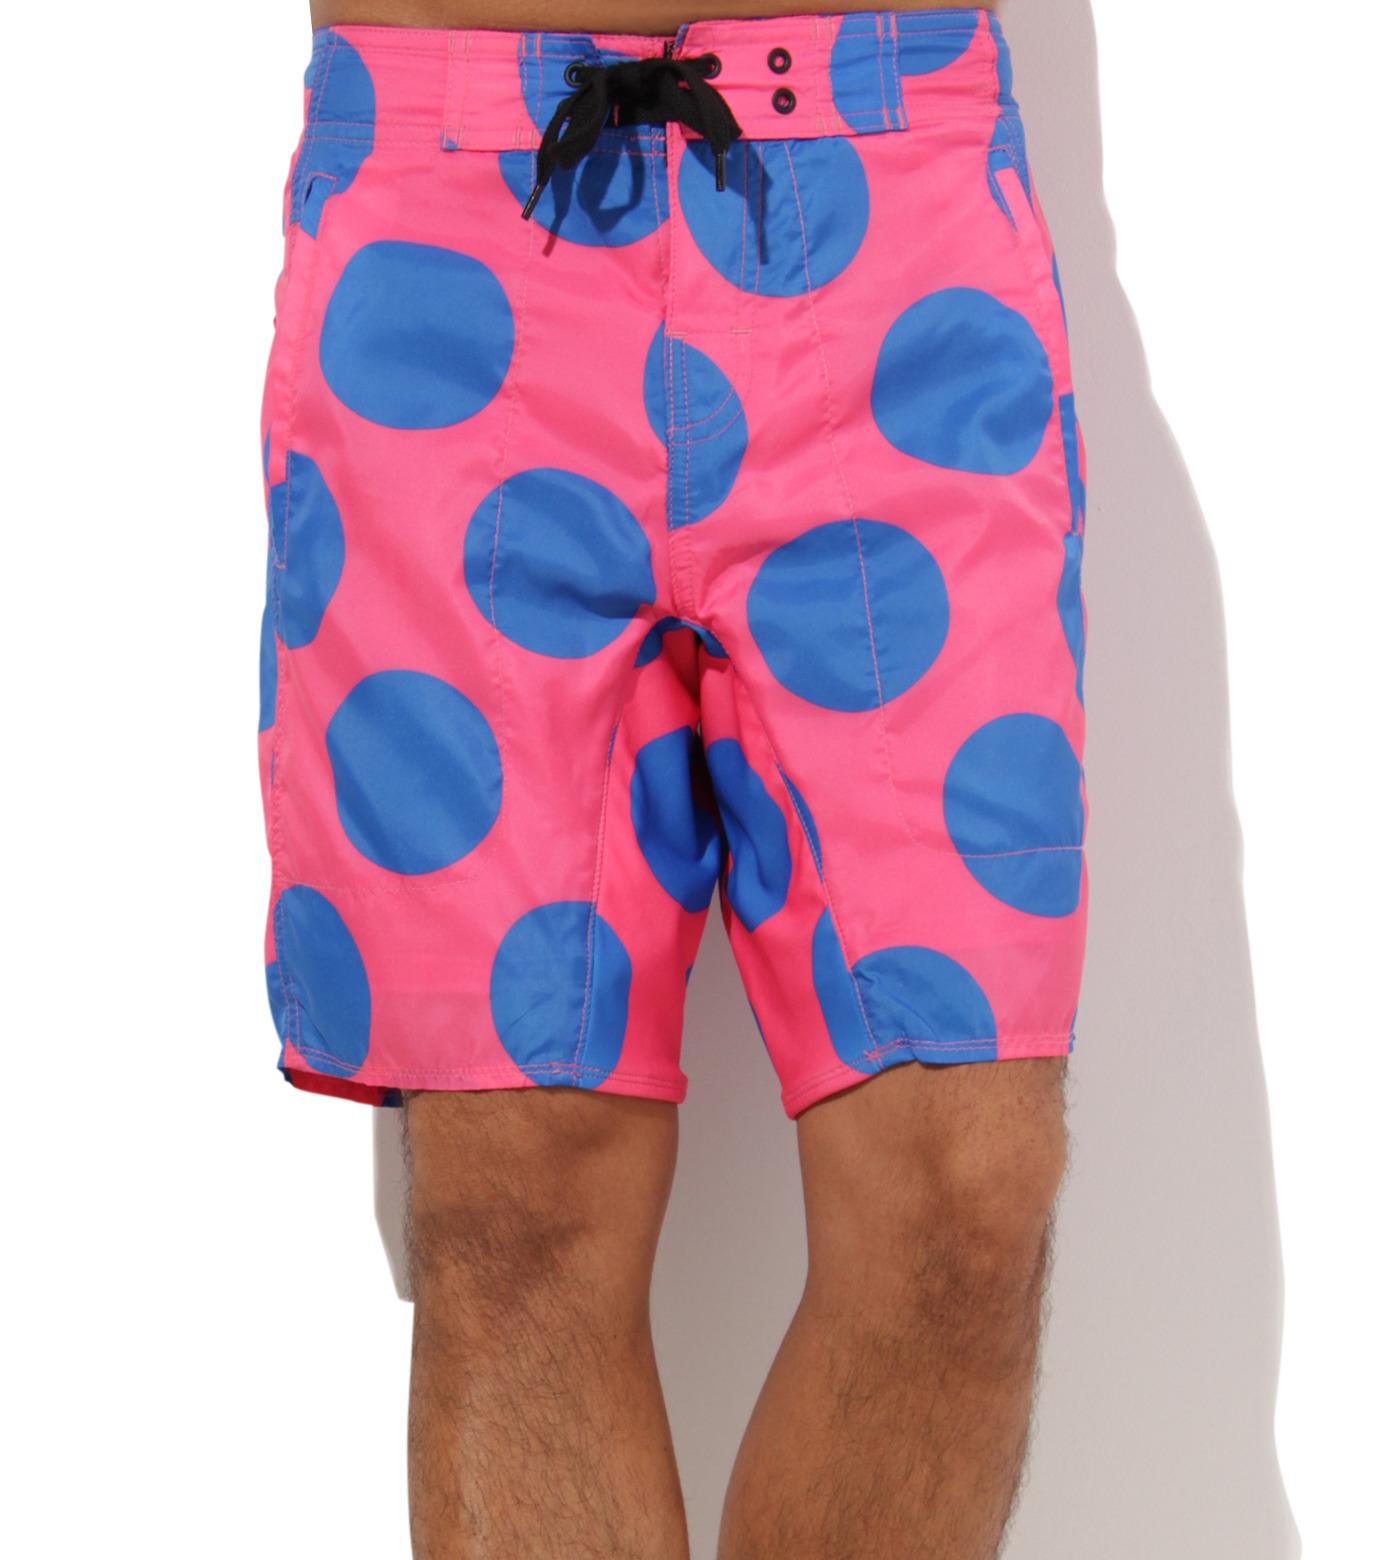 TWO TWO ONE(トゥートゥーワン)のDot surf shorts-SALMON PINK(SWIMWEAR/SWIMWEAR)-15N98003-73 拡大詳細画像3